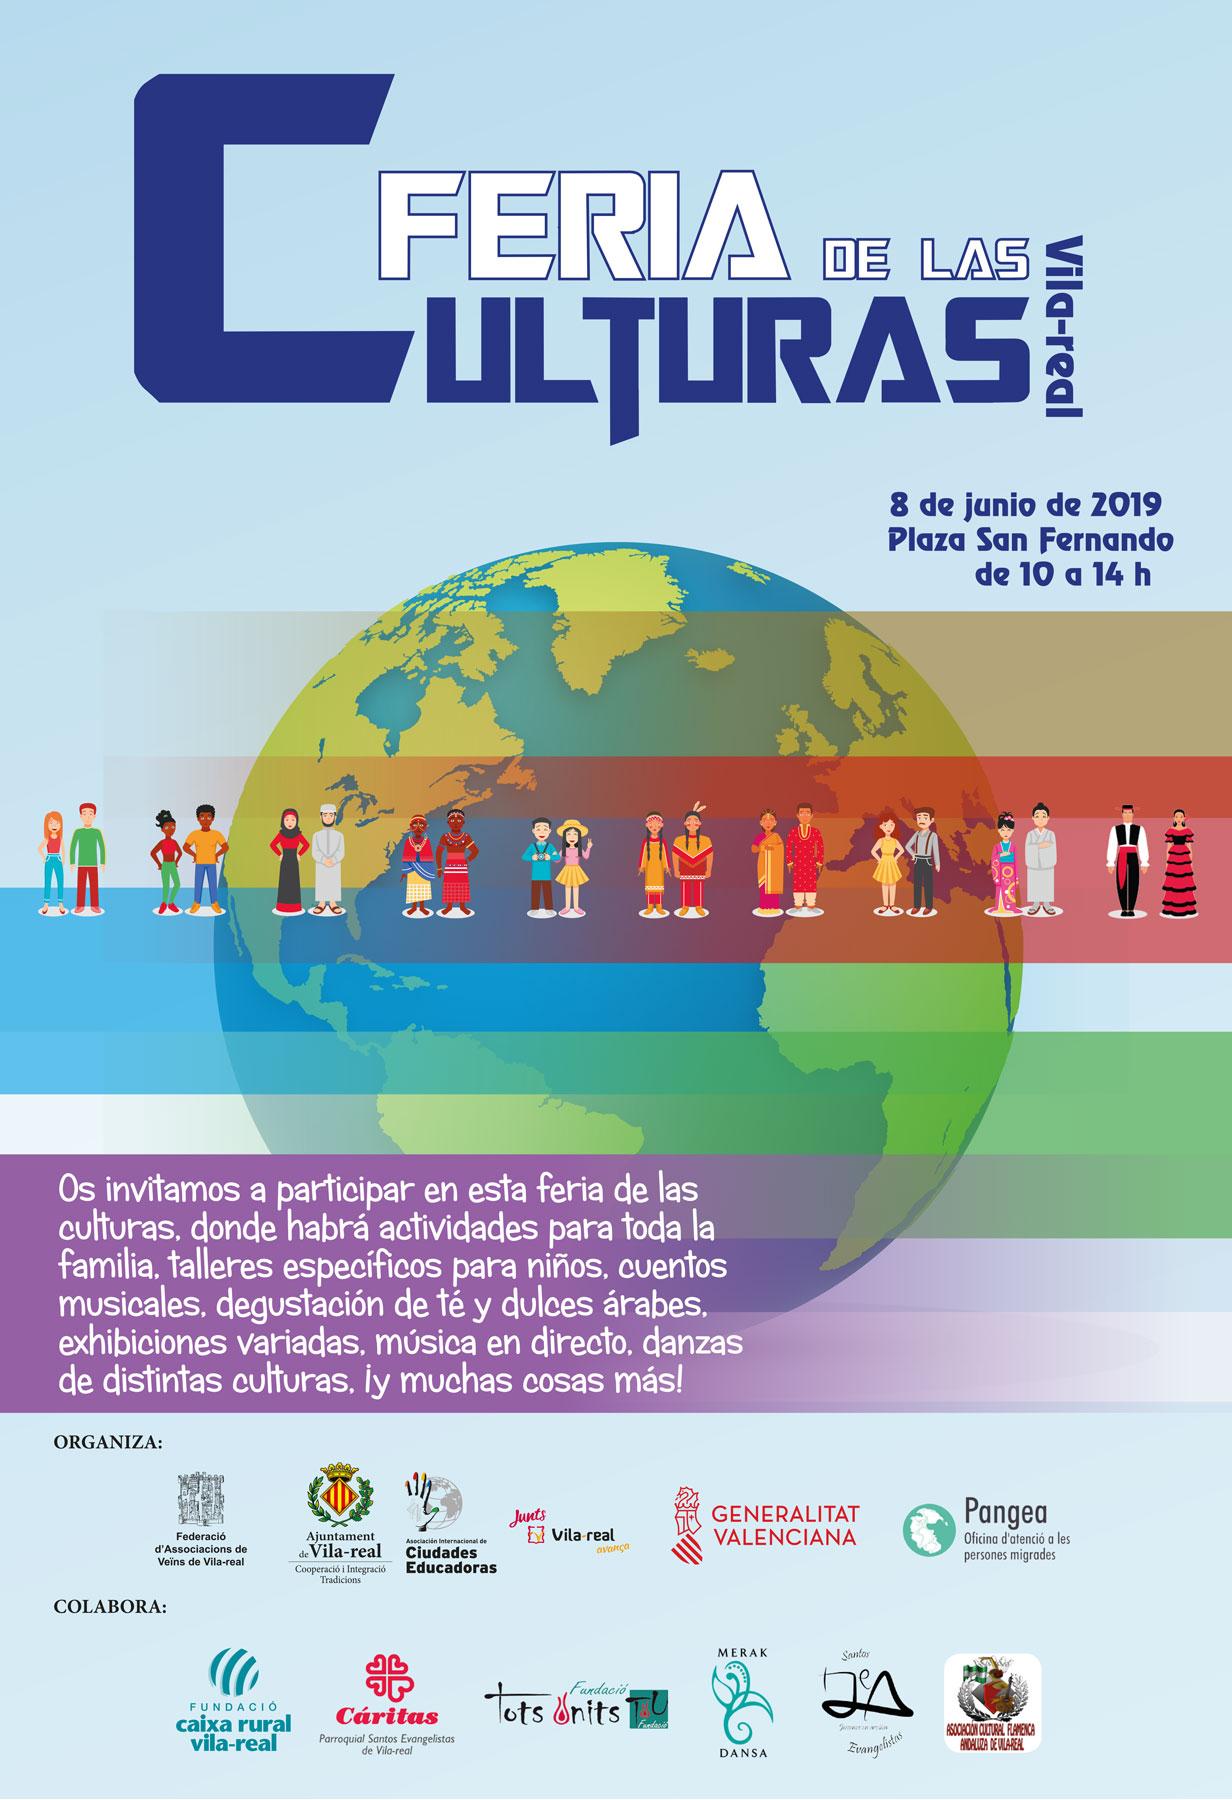 La plaza de Sant Ferran acoge la Feria de las culturas